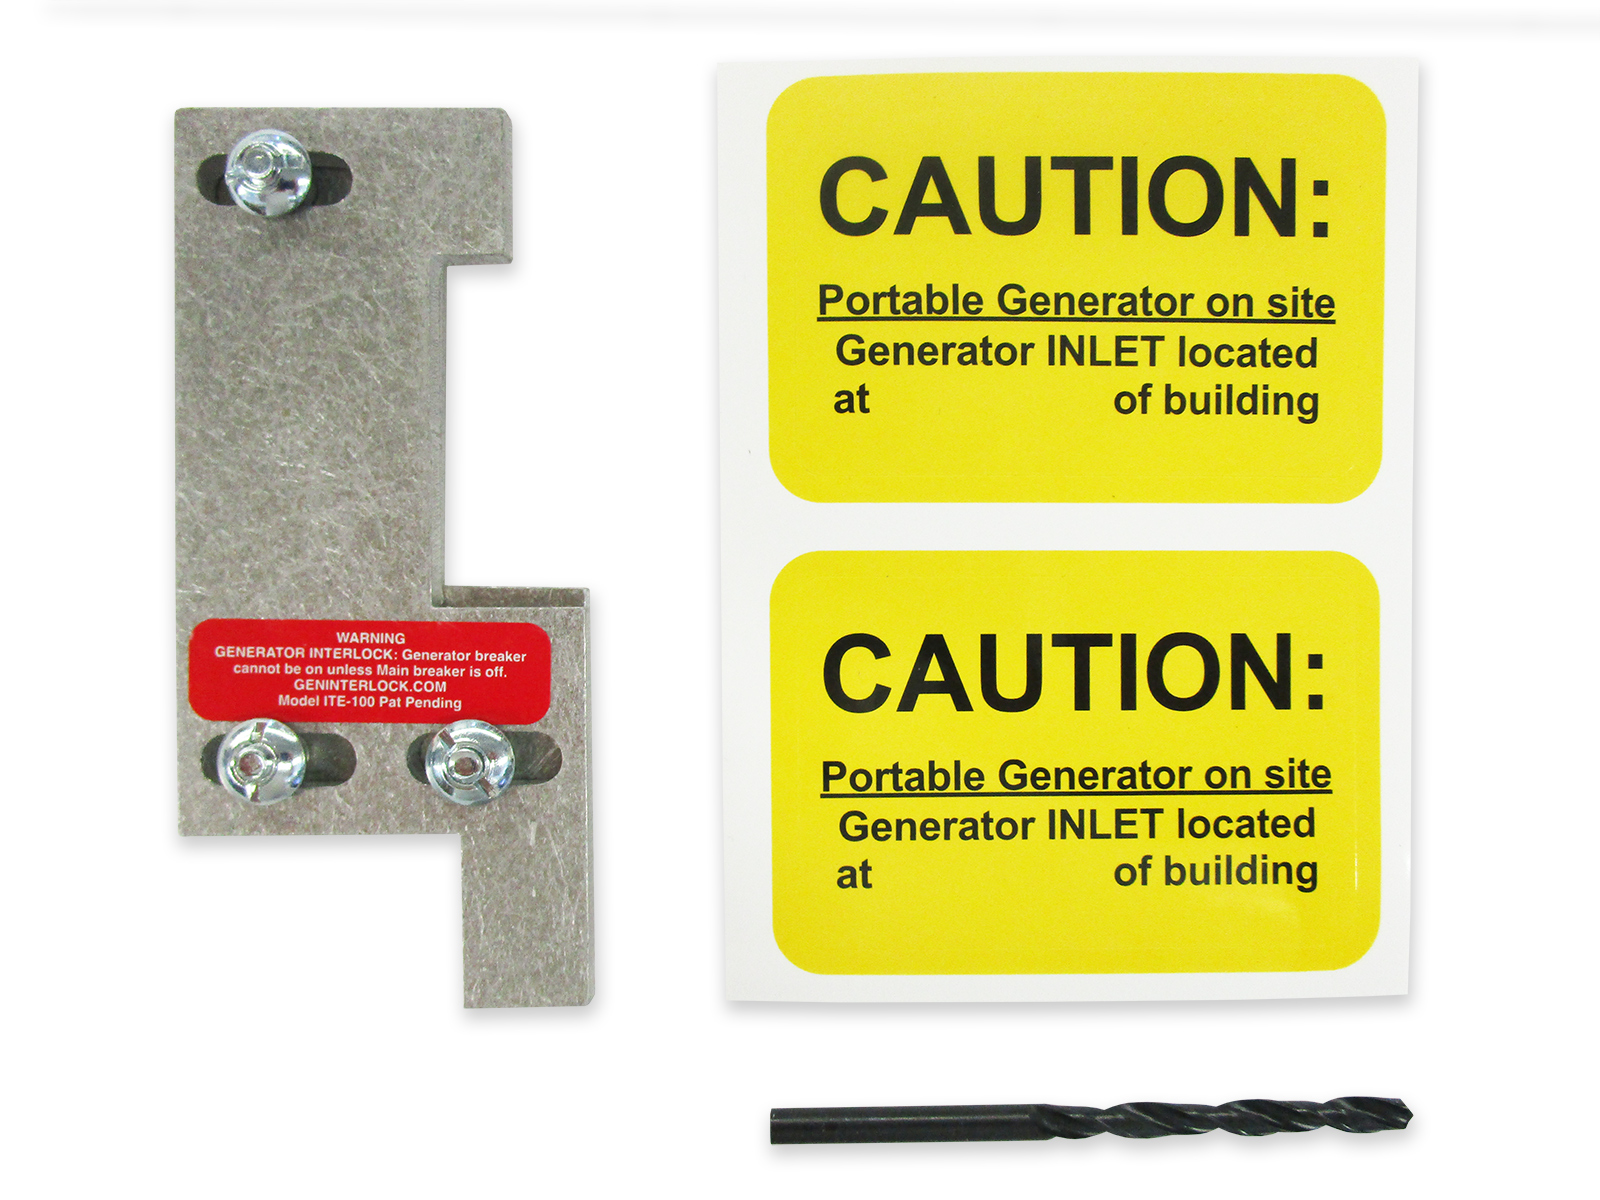 Generator interlock kit fits Gould, ITE, Siemens or Murray 100 Amp Panels |  GenInterlock